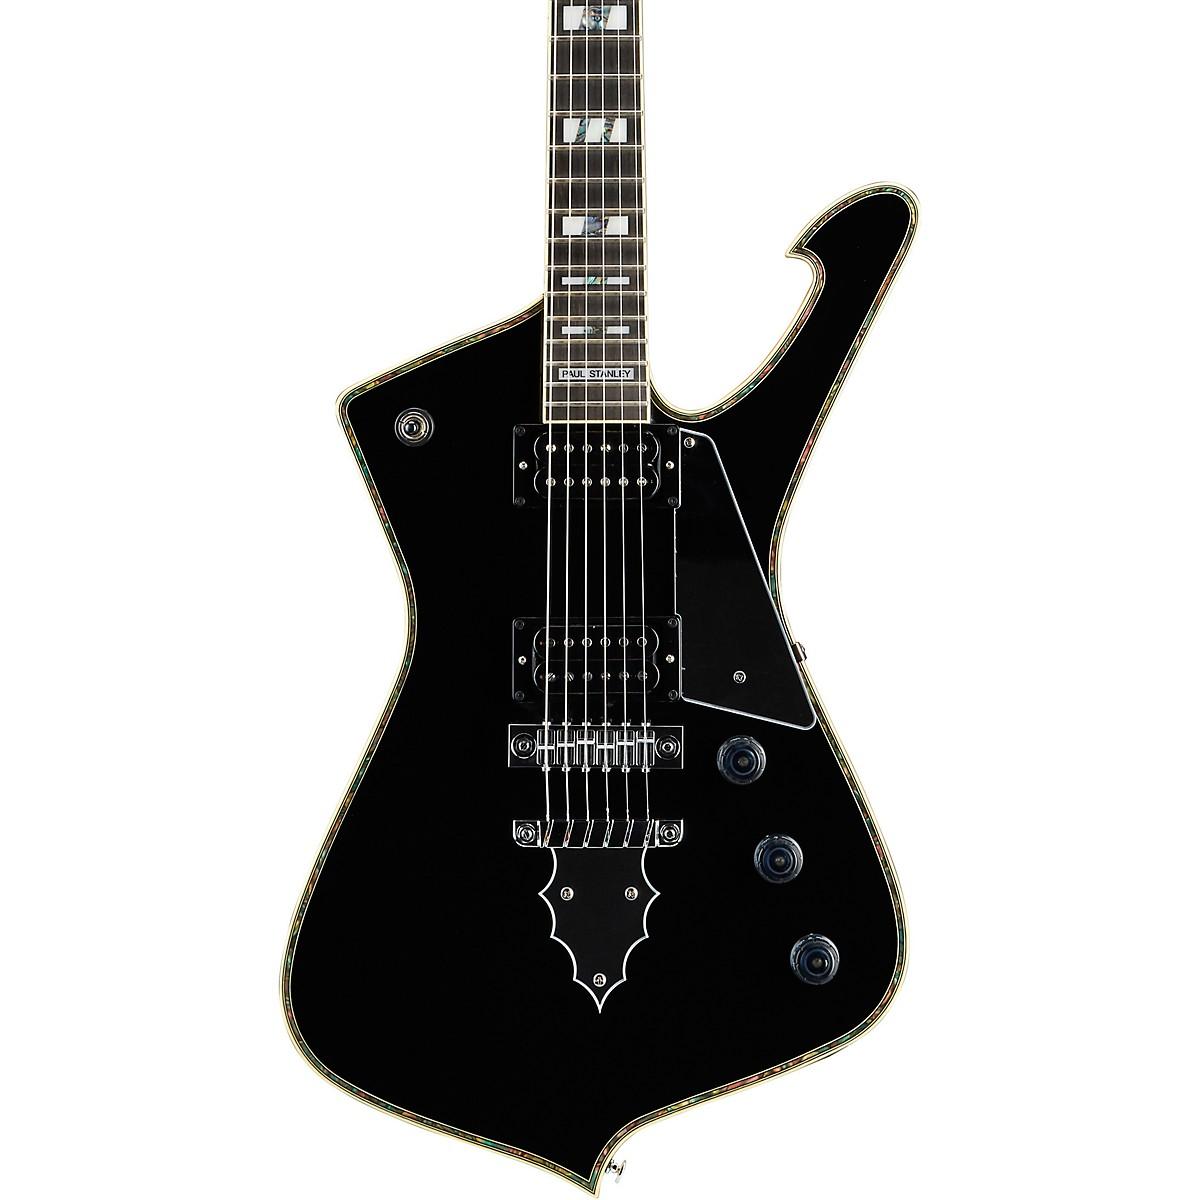 Ibanez PS10 Paul Stanley Prestige Signature Electric Guitar